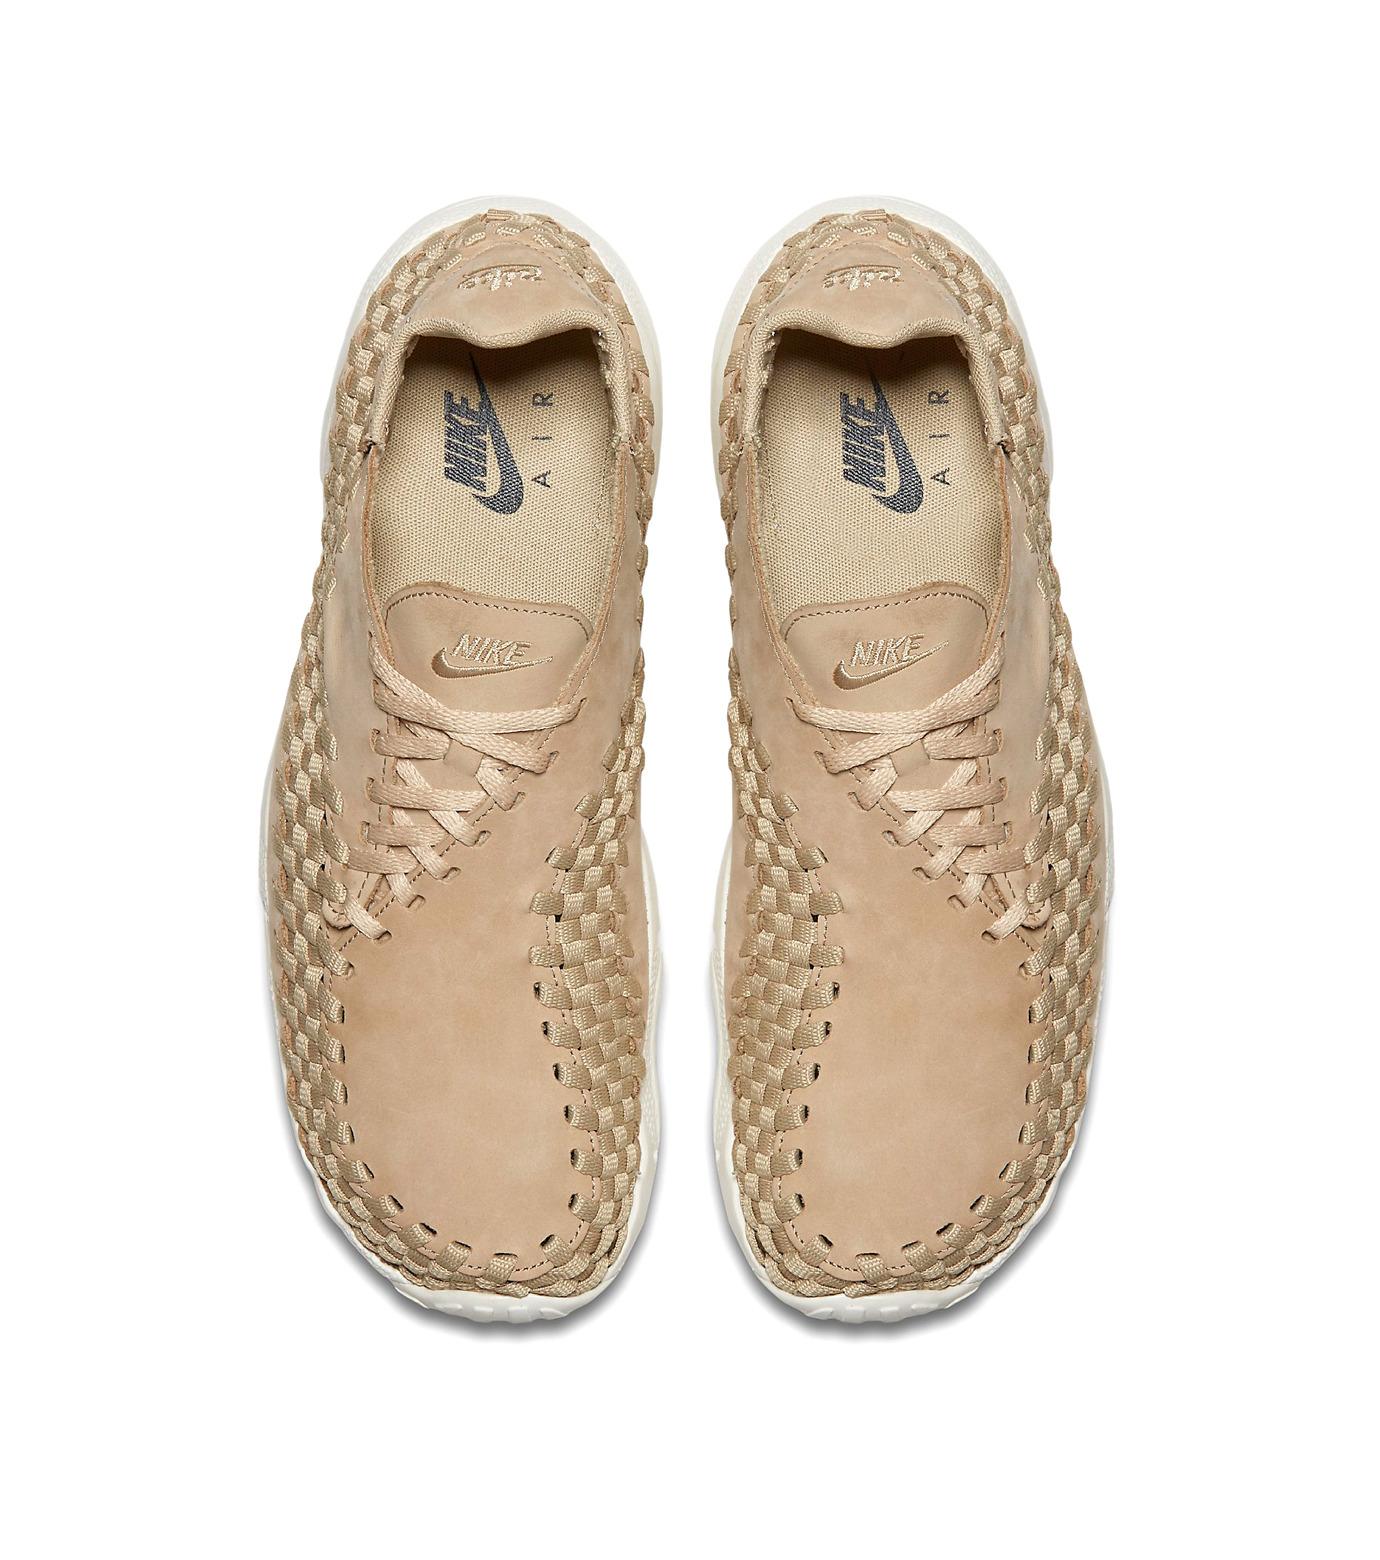 NIKE(ナイキ)のAIR FOOTSCAPE WOVEN NM-LIGHT BEIGE(シューズ/shoes)-874892-200-51 拡大詳細画像4